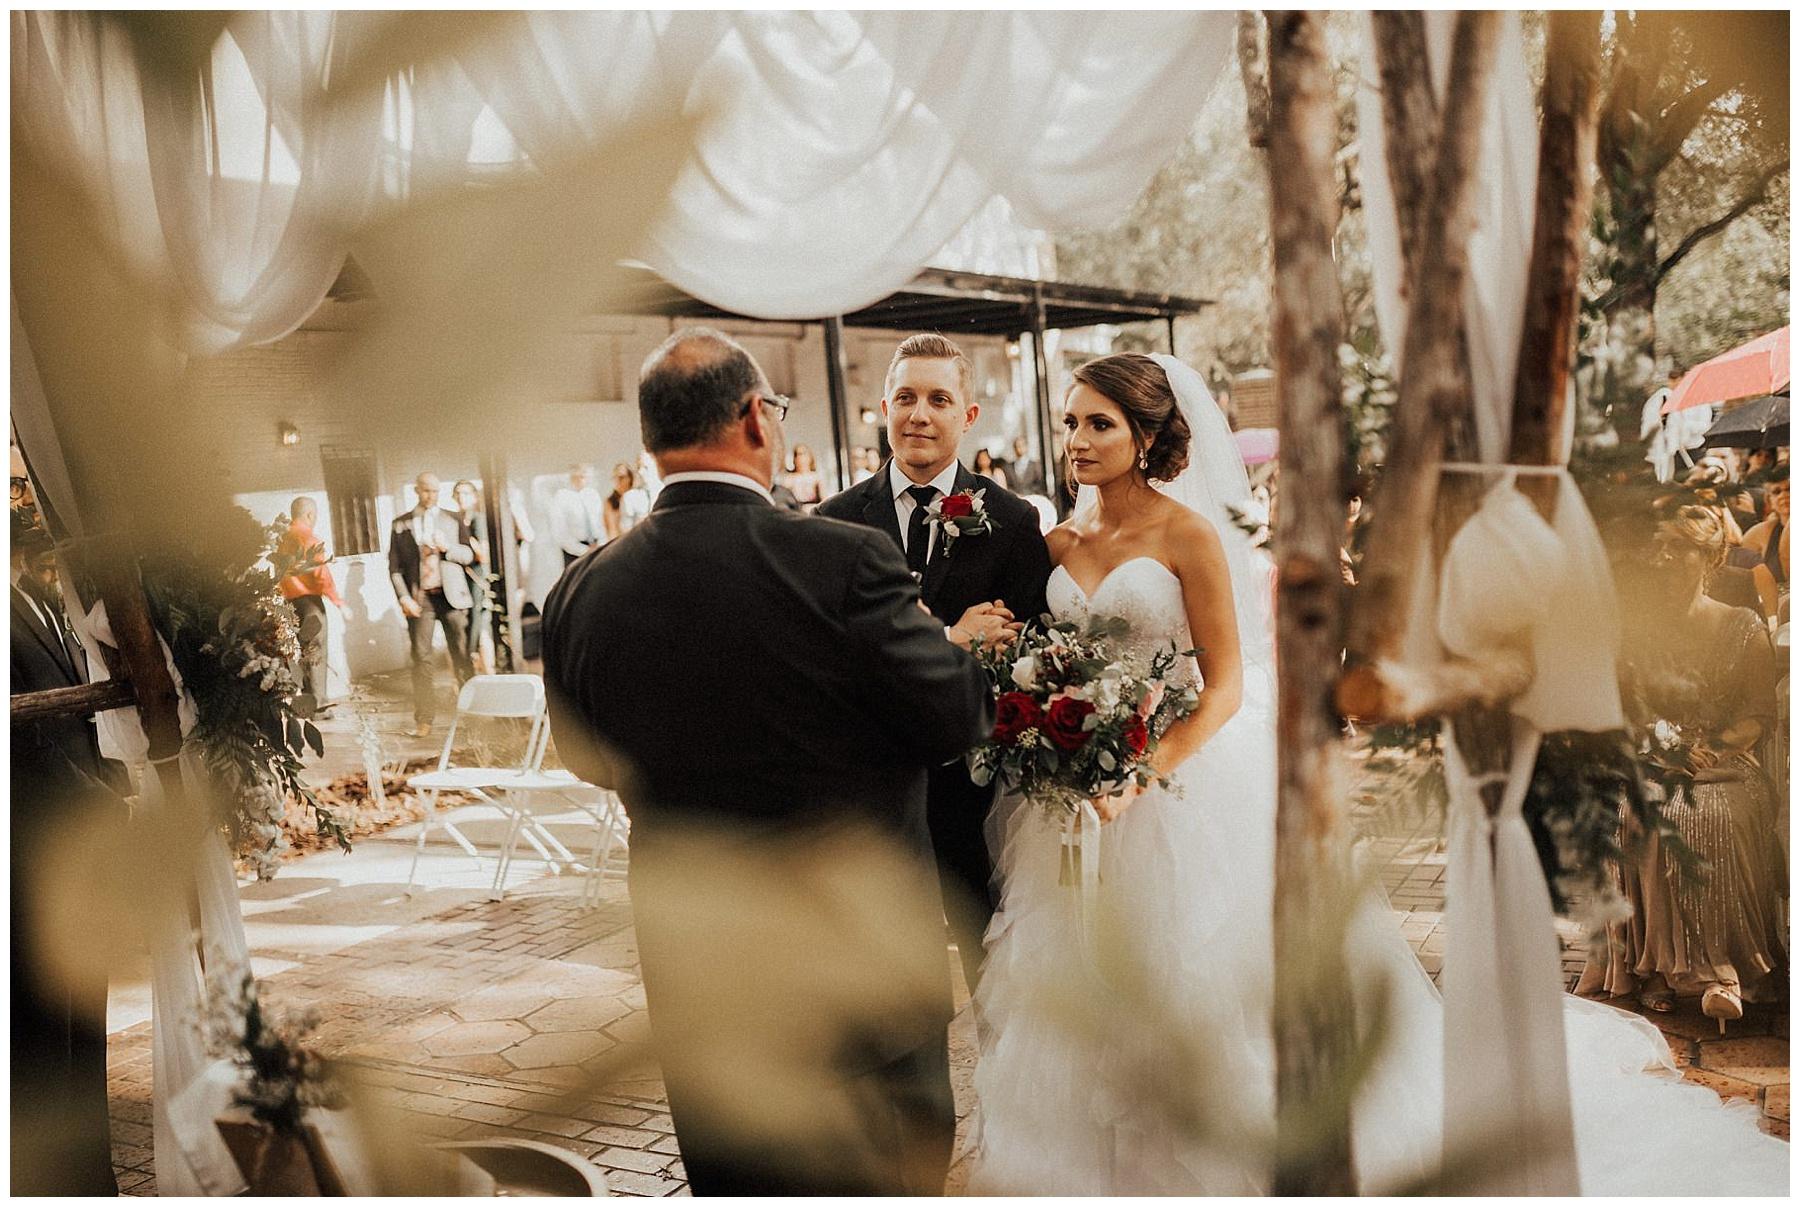 YBOR Wedding Tampa Wedding Photographer-68.jpg